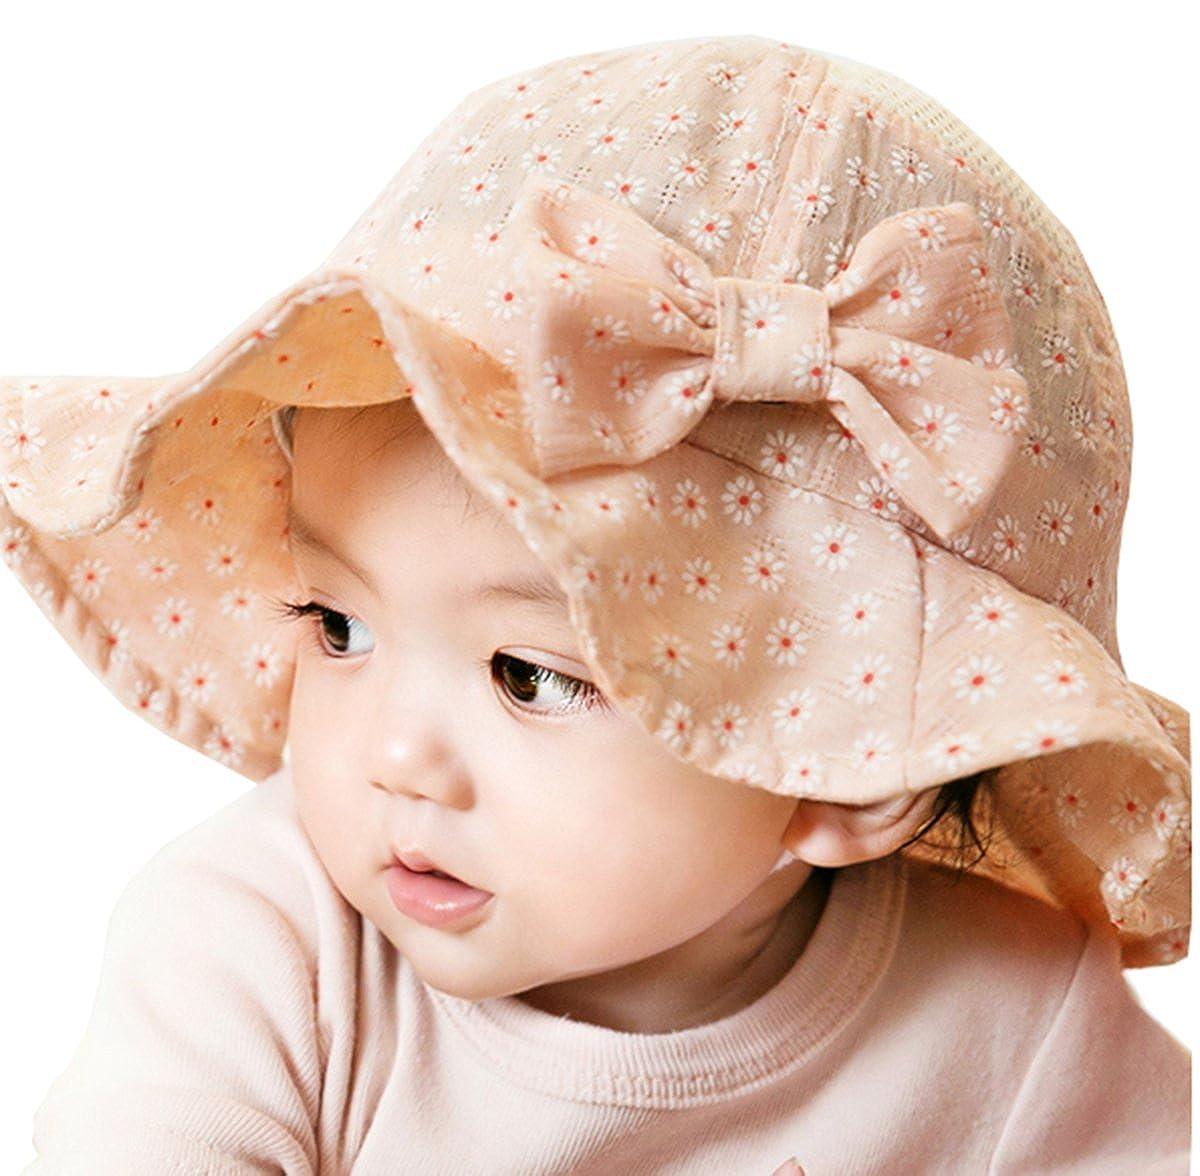 TAIYCYXGAN HAT ベビーガールズ 6 - 24 Months ピンク B01FHJ7100